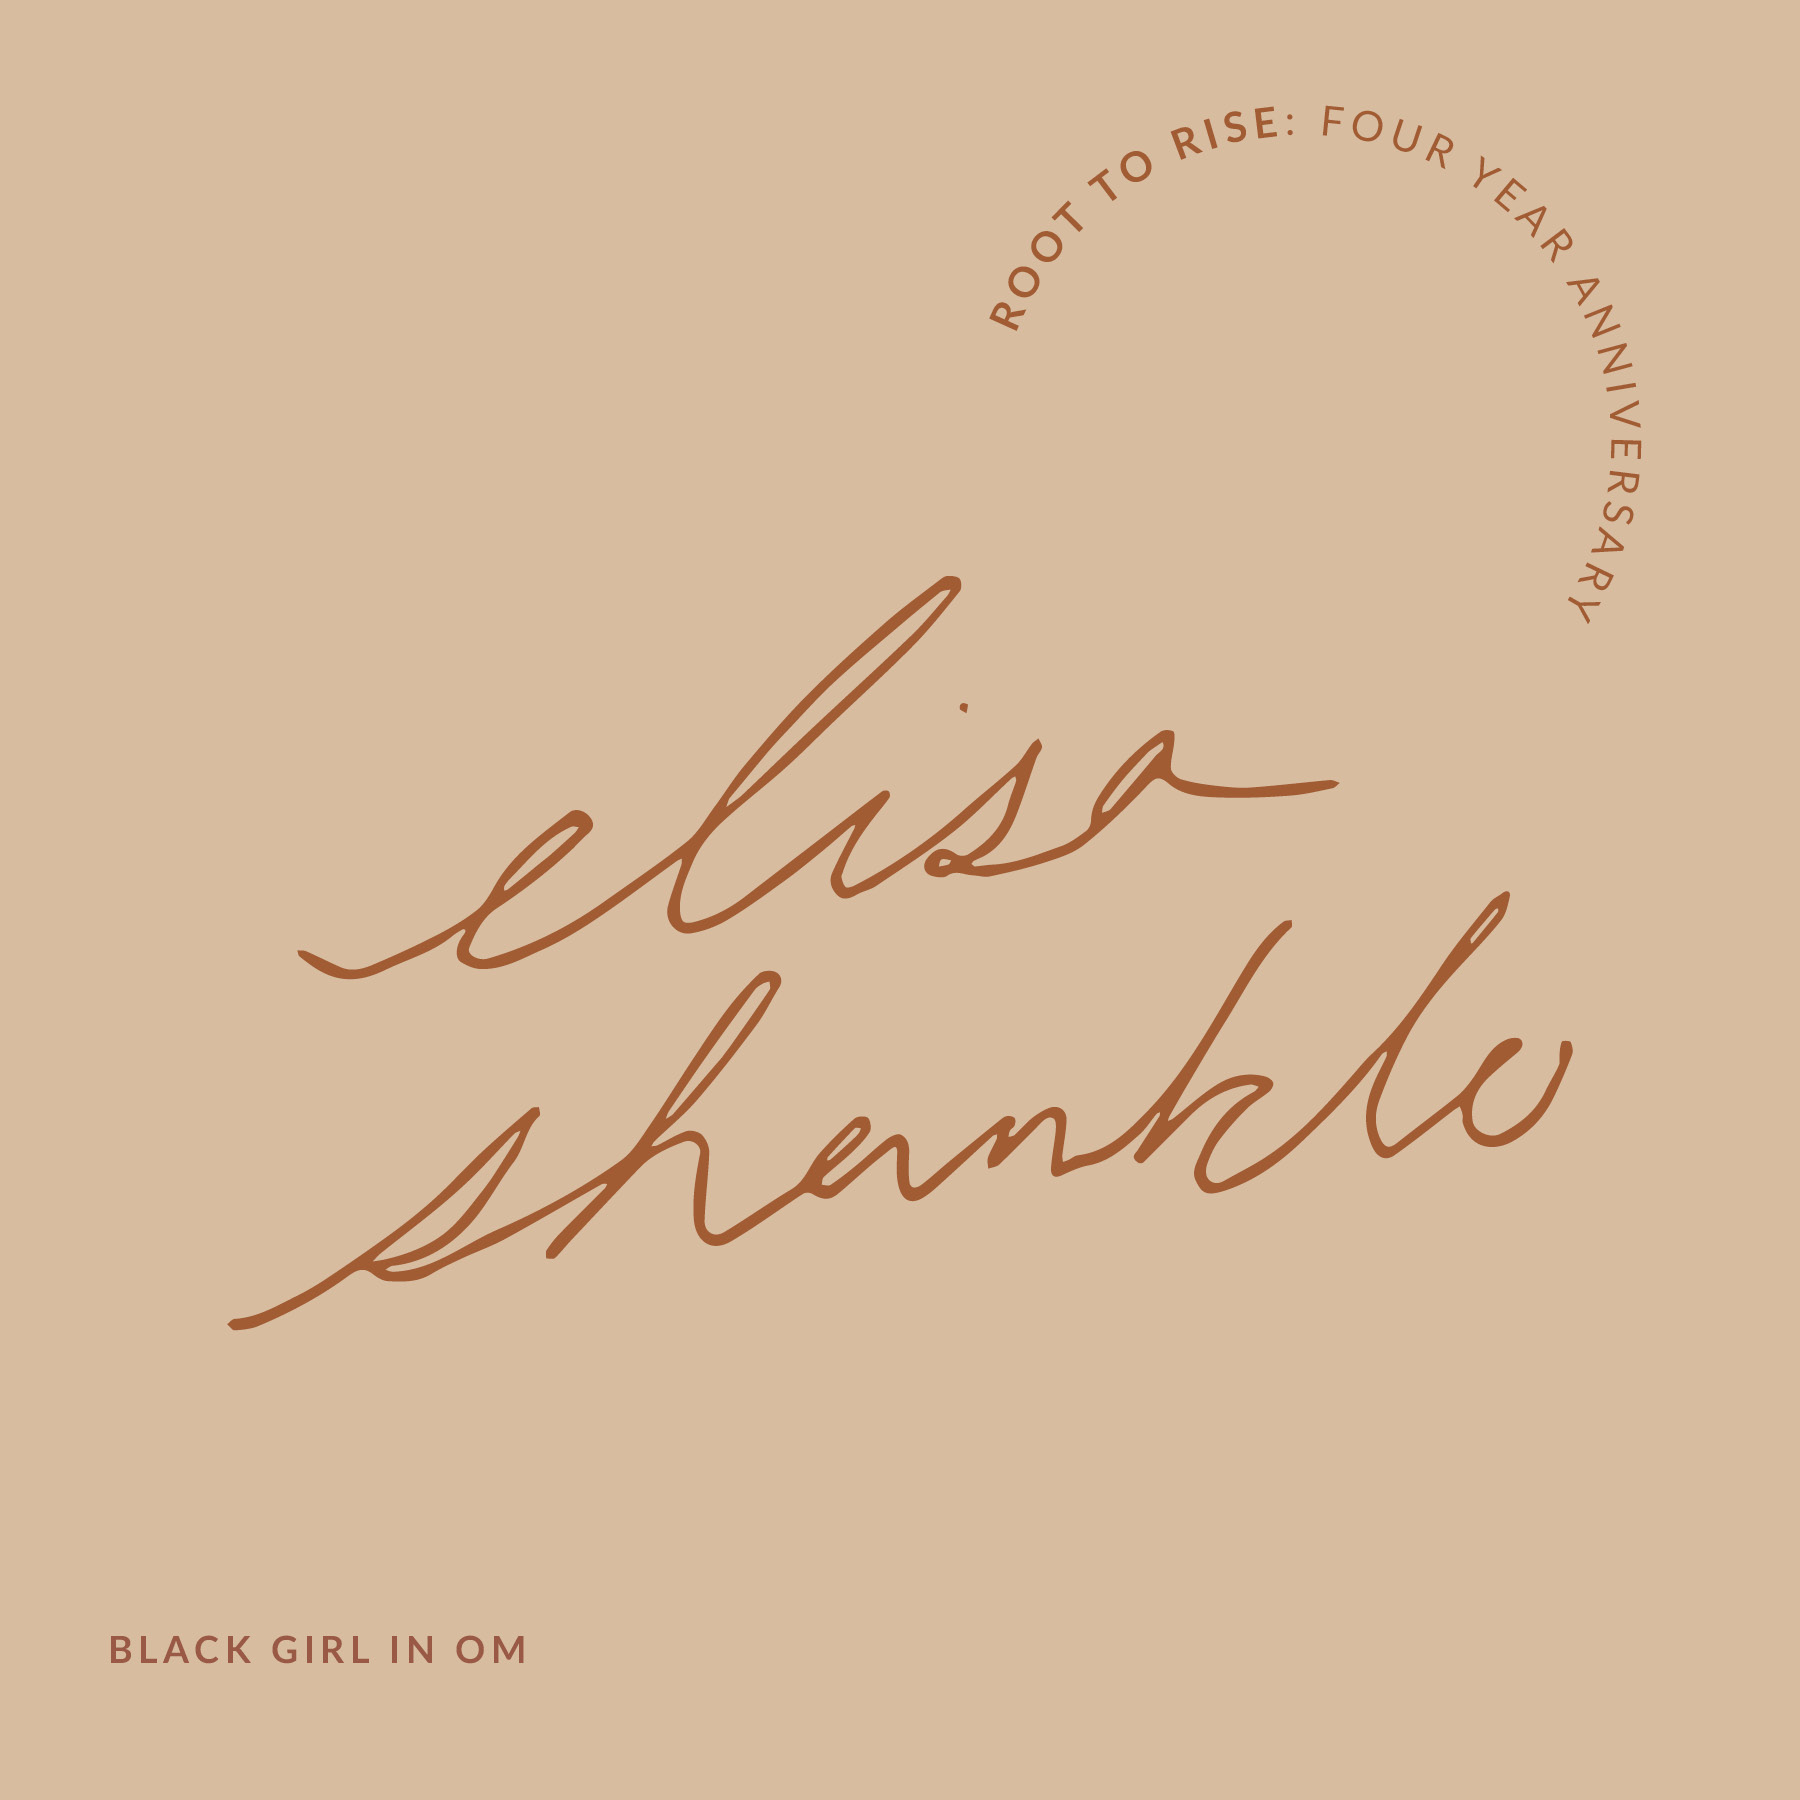 Elisa Shankle Root to Rise Name.jpg